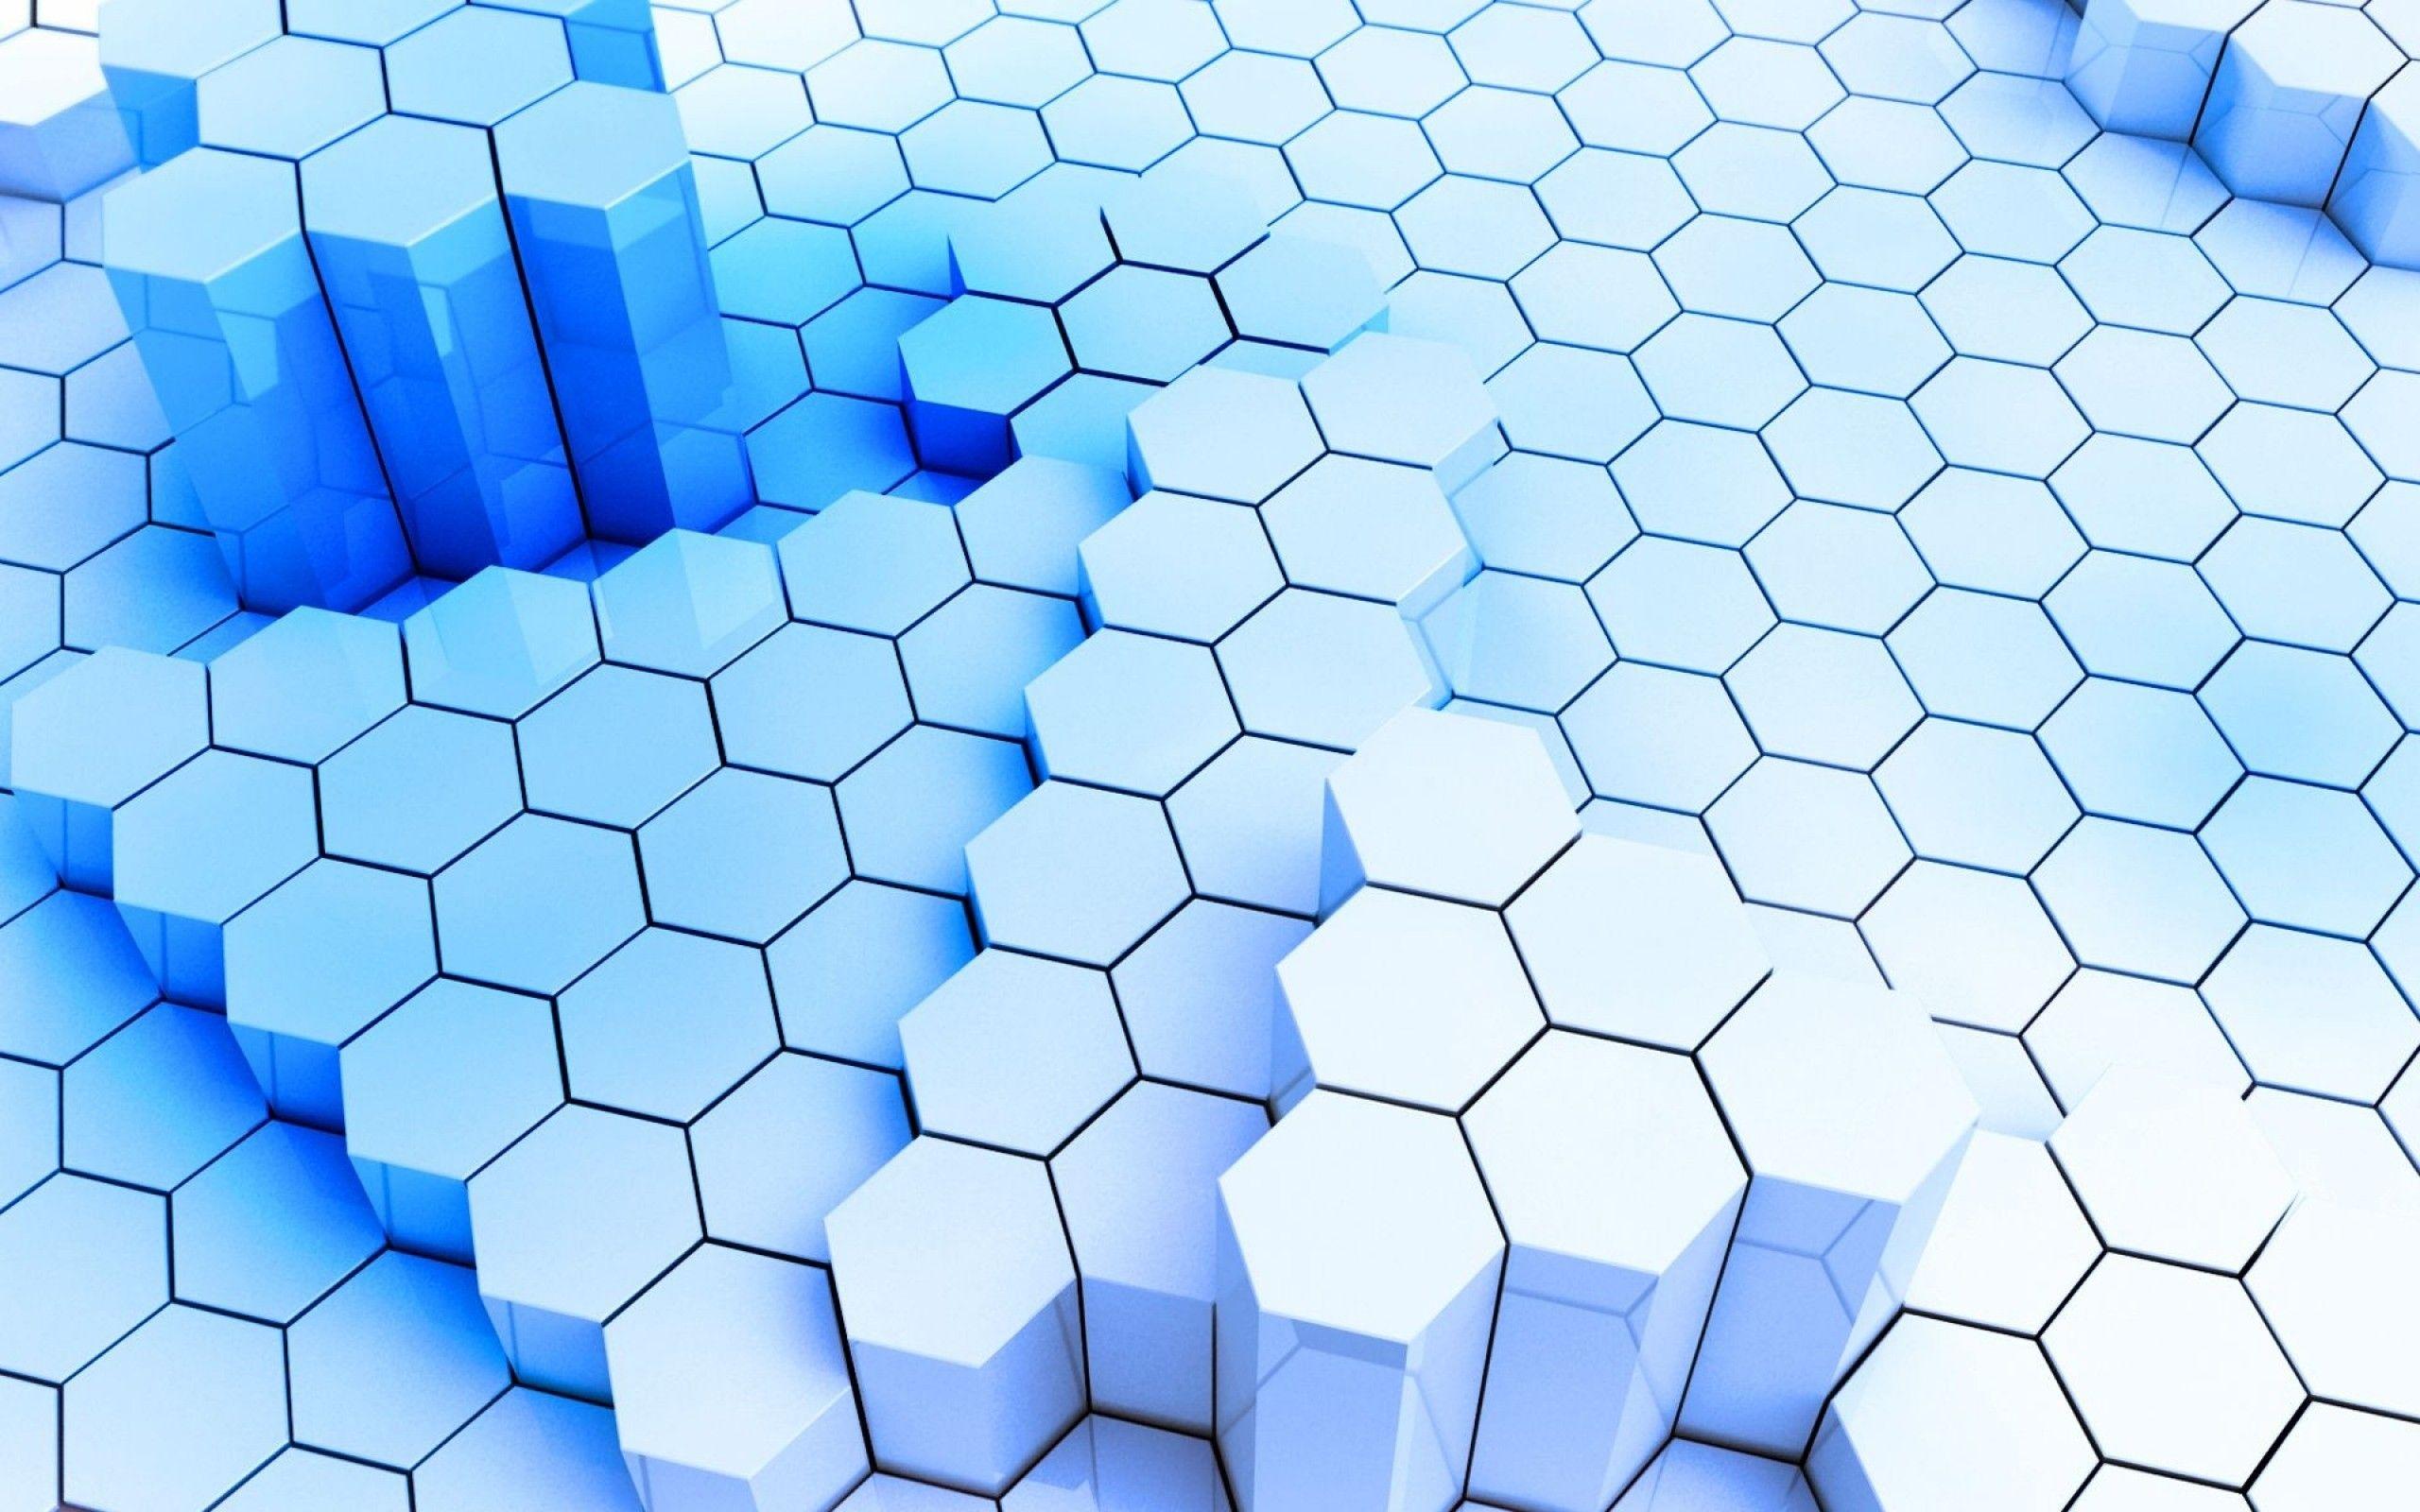 Graphic Design Graphics Grafico Art Design 3d Art Upscaled Wallpaper 2560x1600 187019 Wallpaperup Hexagon Wallpaper Hexagon Wallpaper